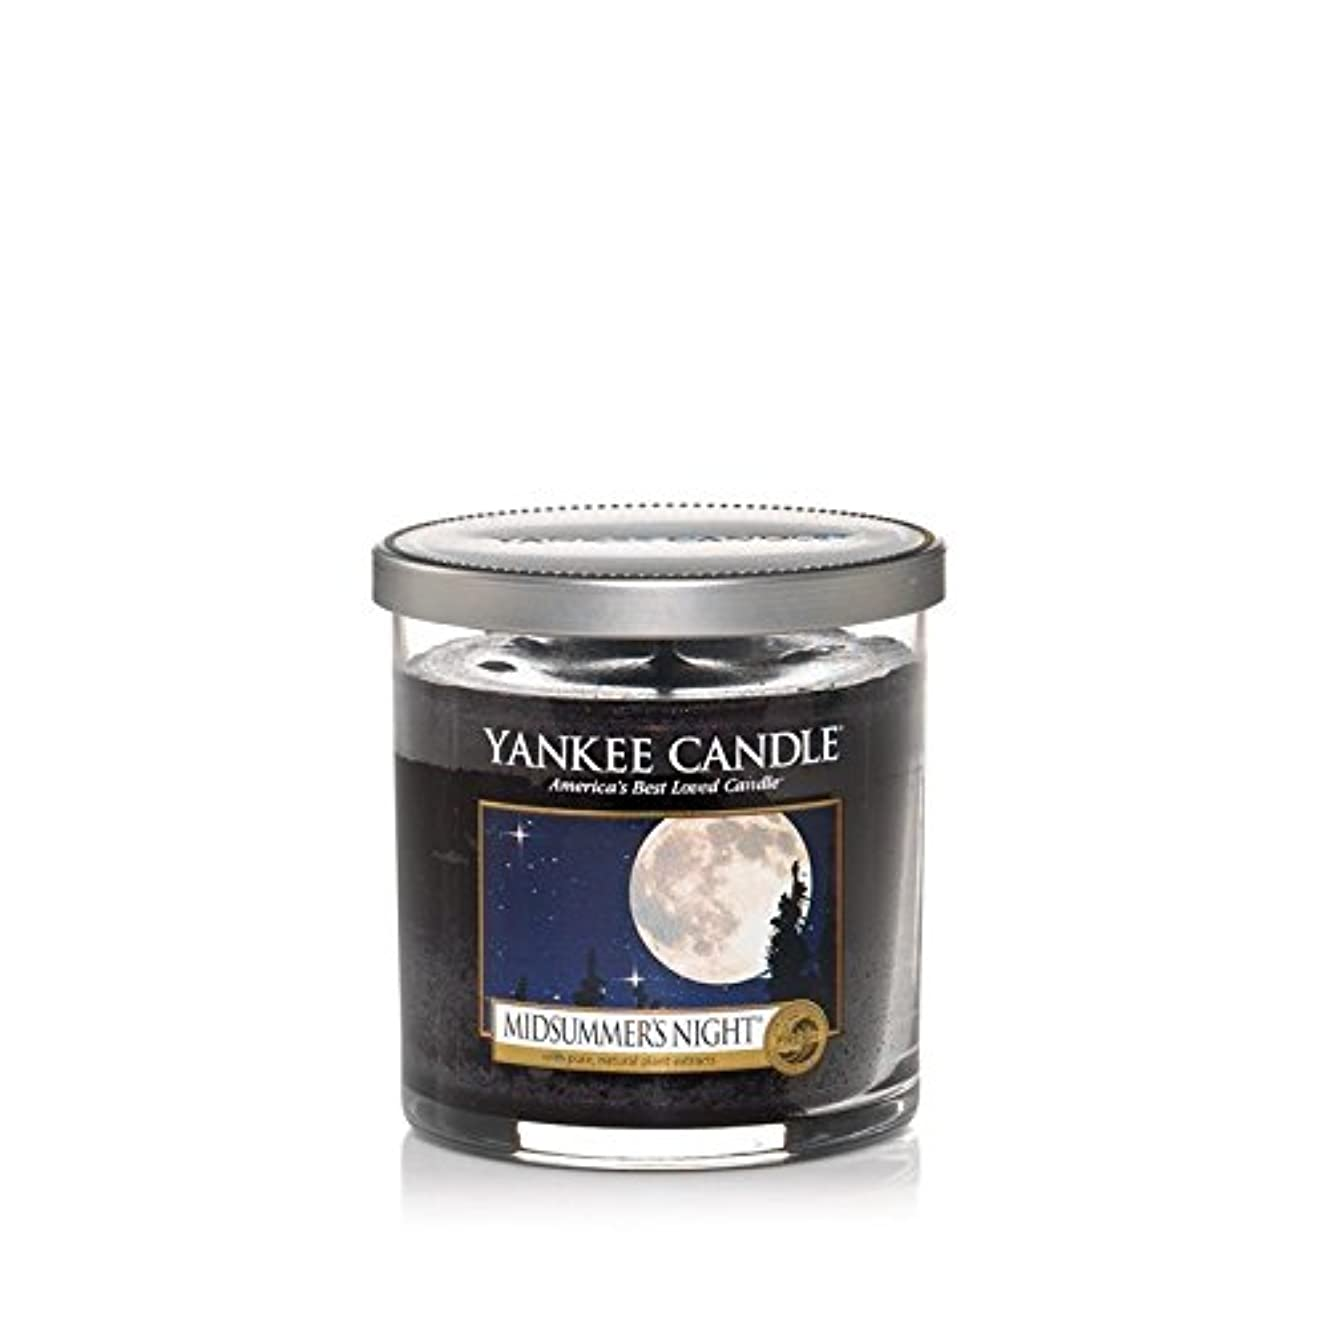 Yankee Candles Small Pillar Candle - Midsummers Night (Pack of 2) - ヤンキーキャンドルの小さな柱キャンドル - Midsummers夜 (x2) [並行輸入品]